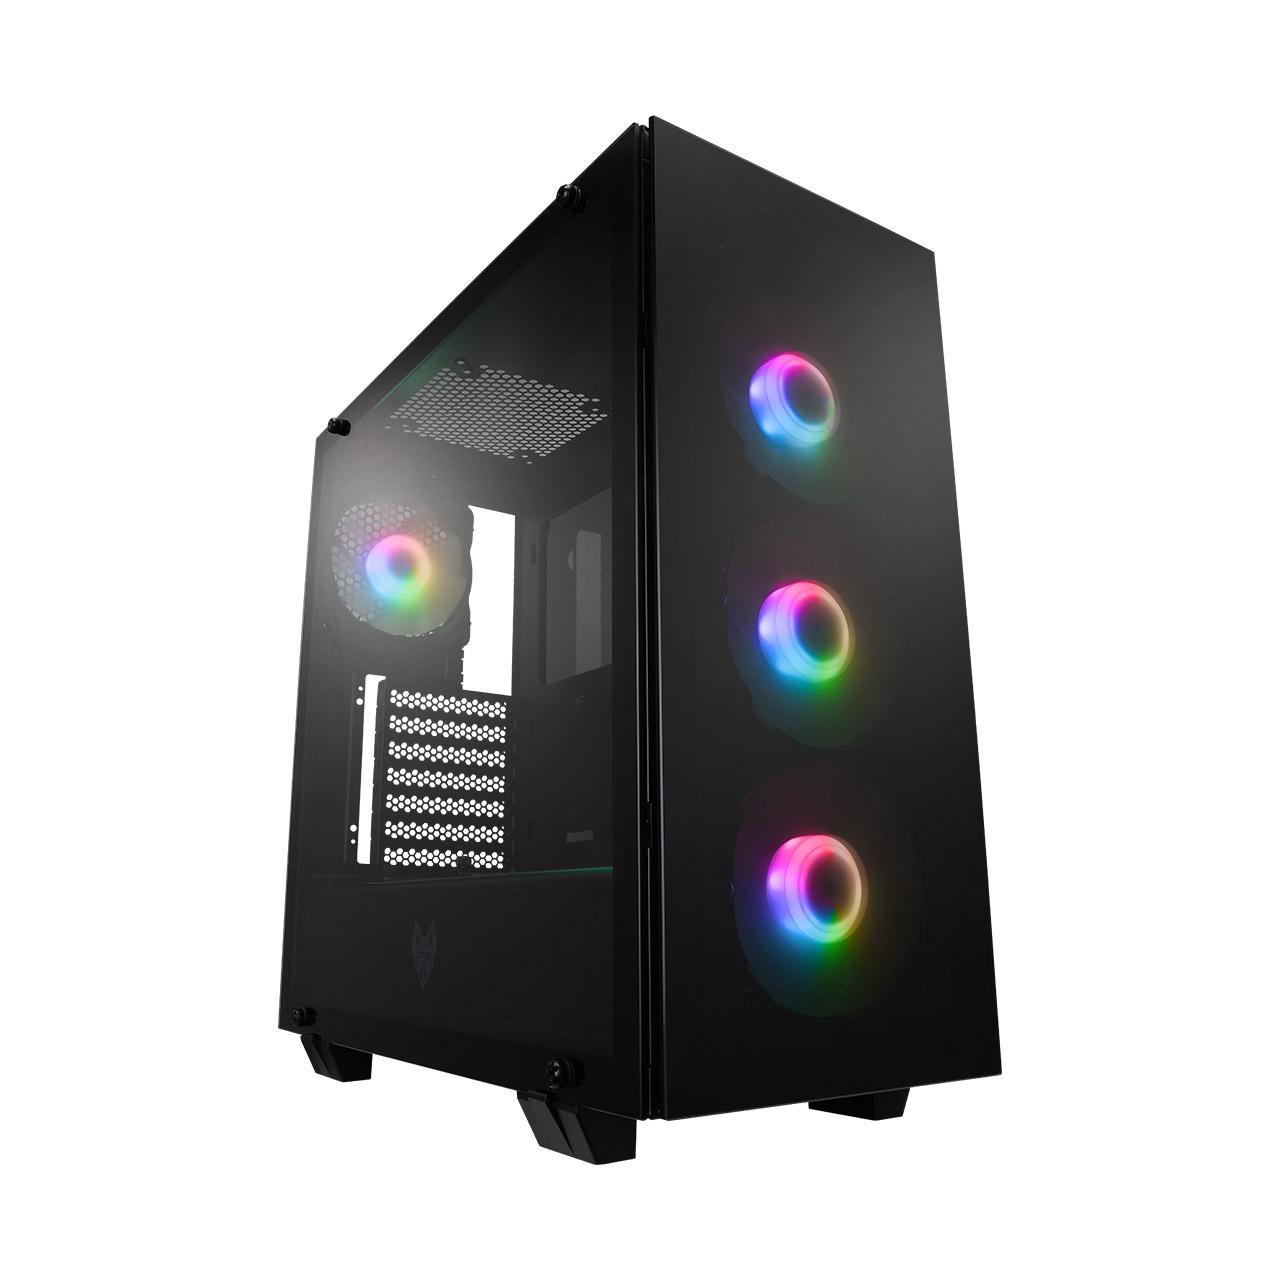 FSP/Fortron ATX Midi Tower CMT512 Black, průhledná bočnice, 4 x A.RGB LED 120 mm ventilátor - POC0000107